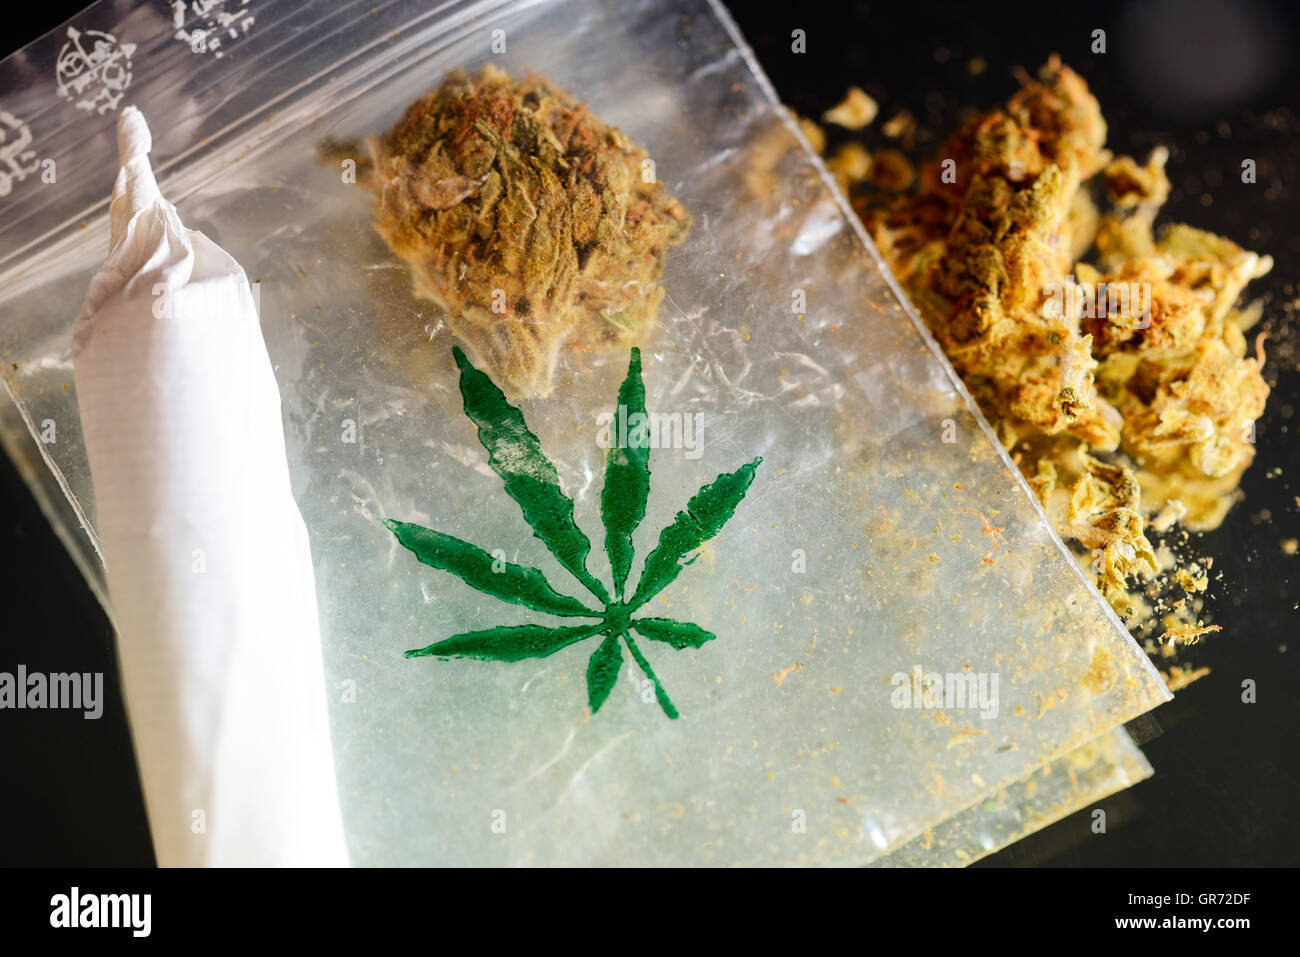 Marijuana And Joint - Stock Image